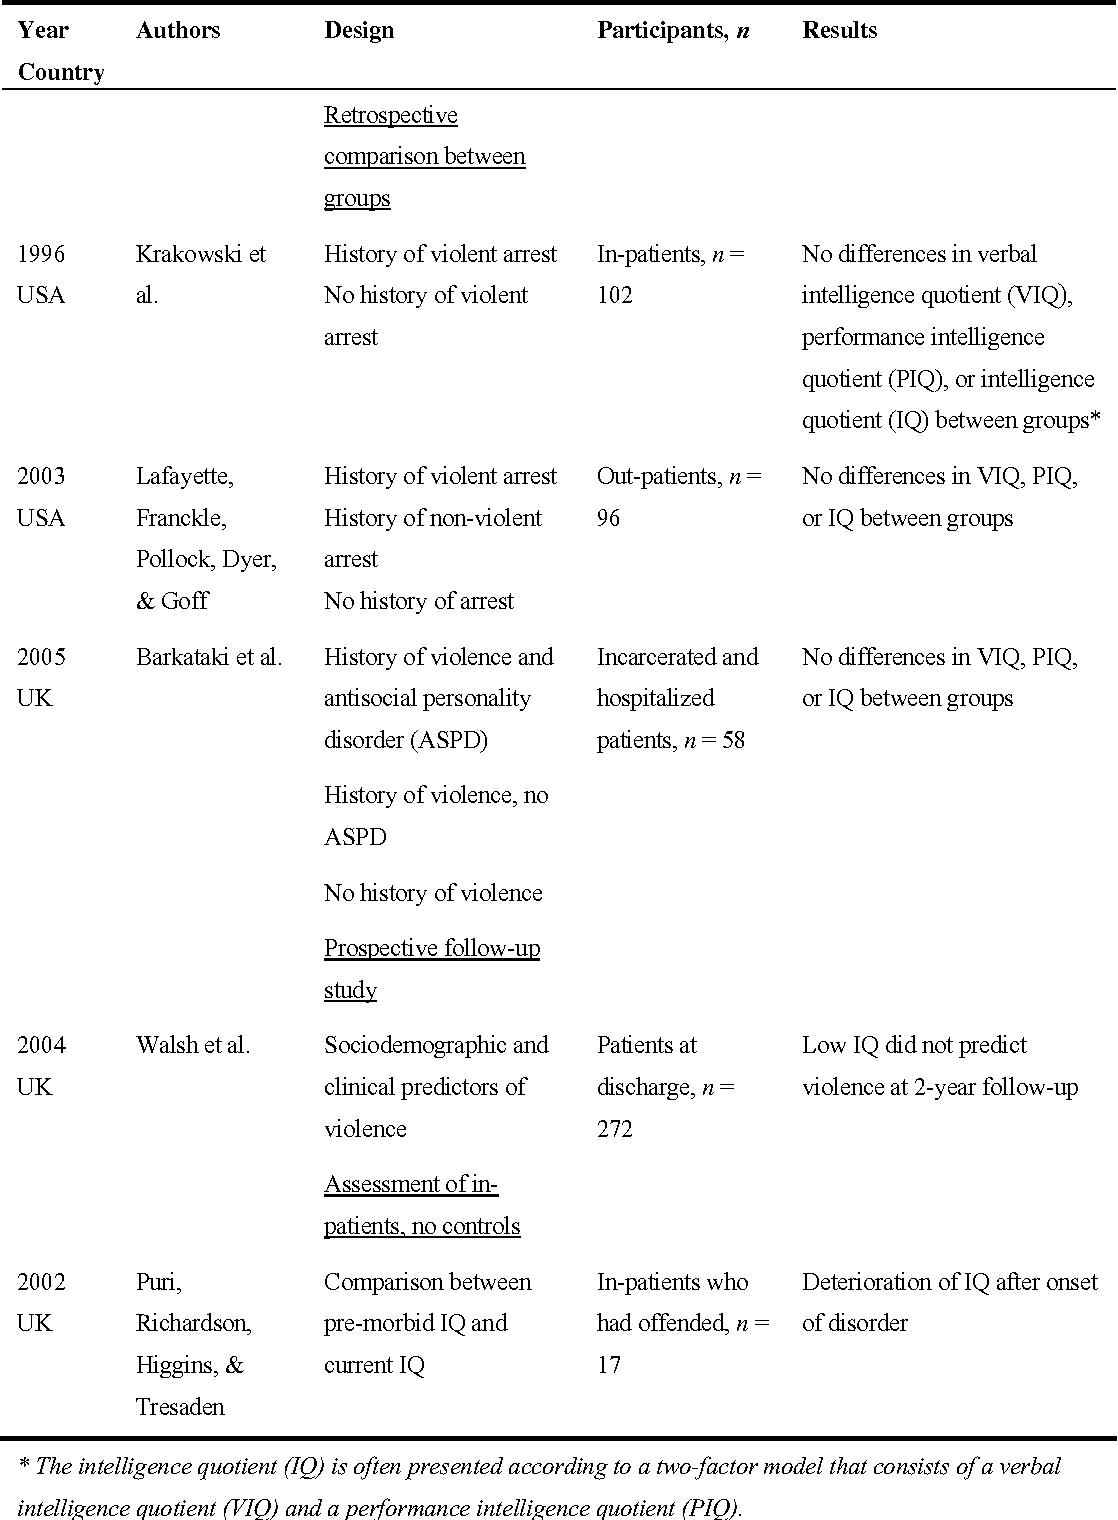 PDF] Schizophrenia and criminal offending : Risk factors and